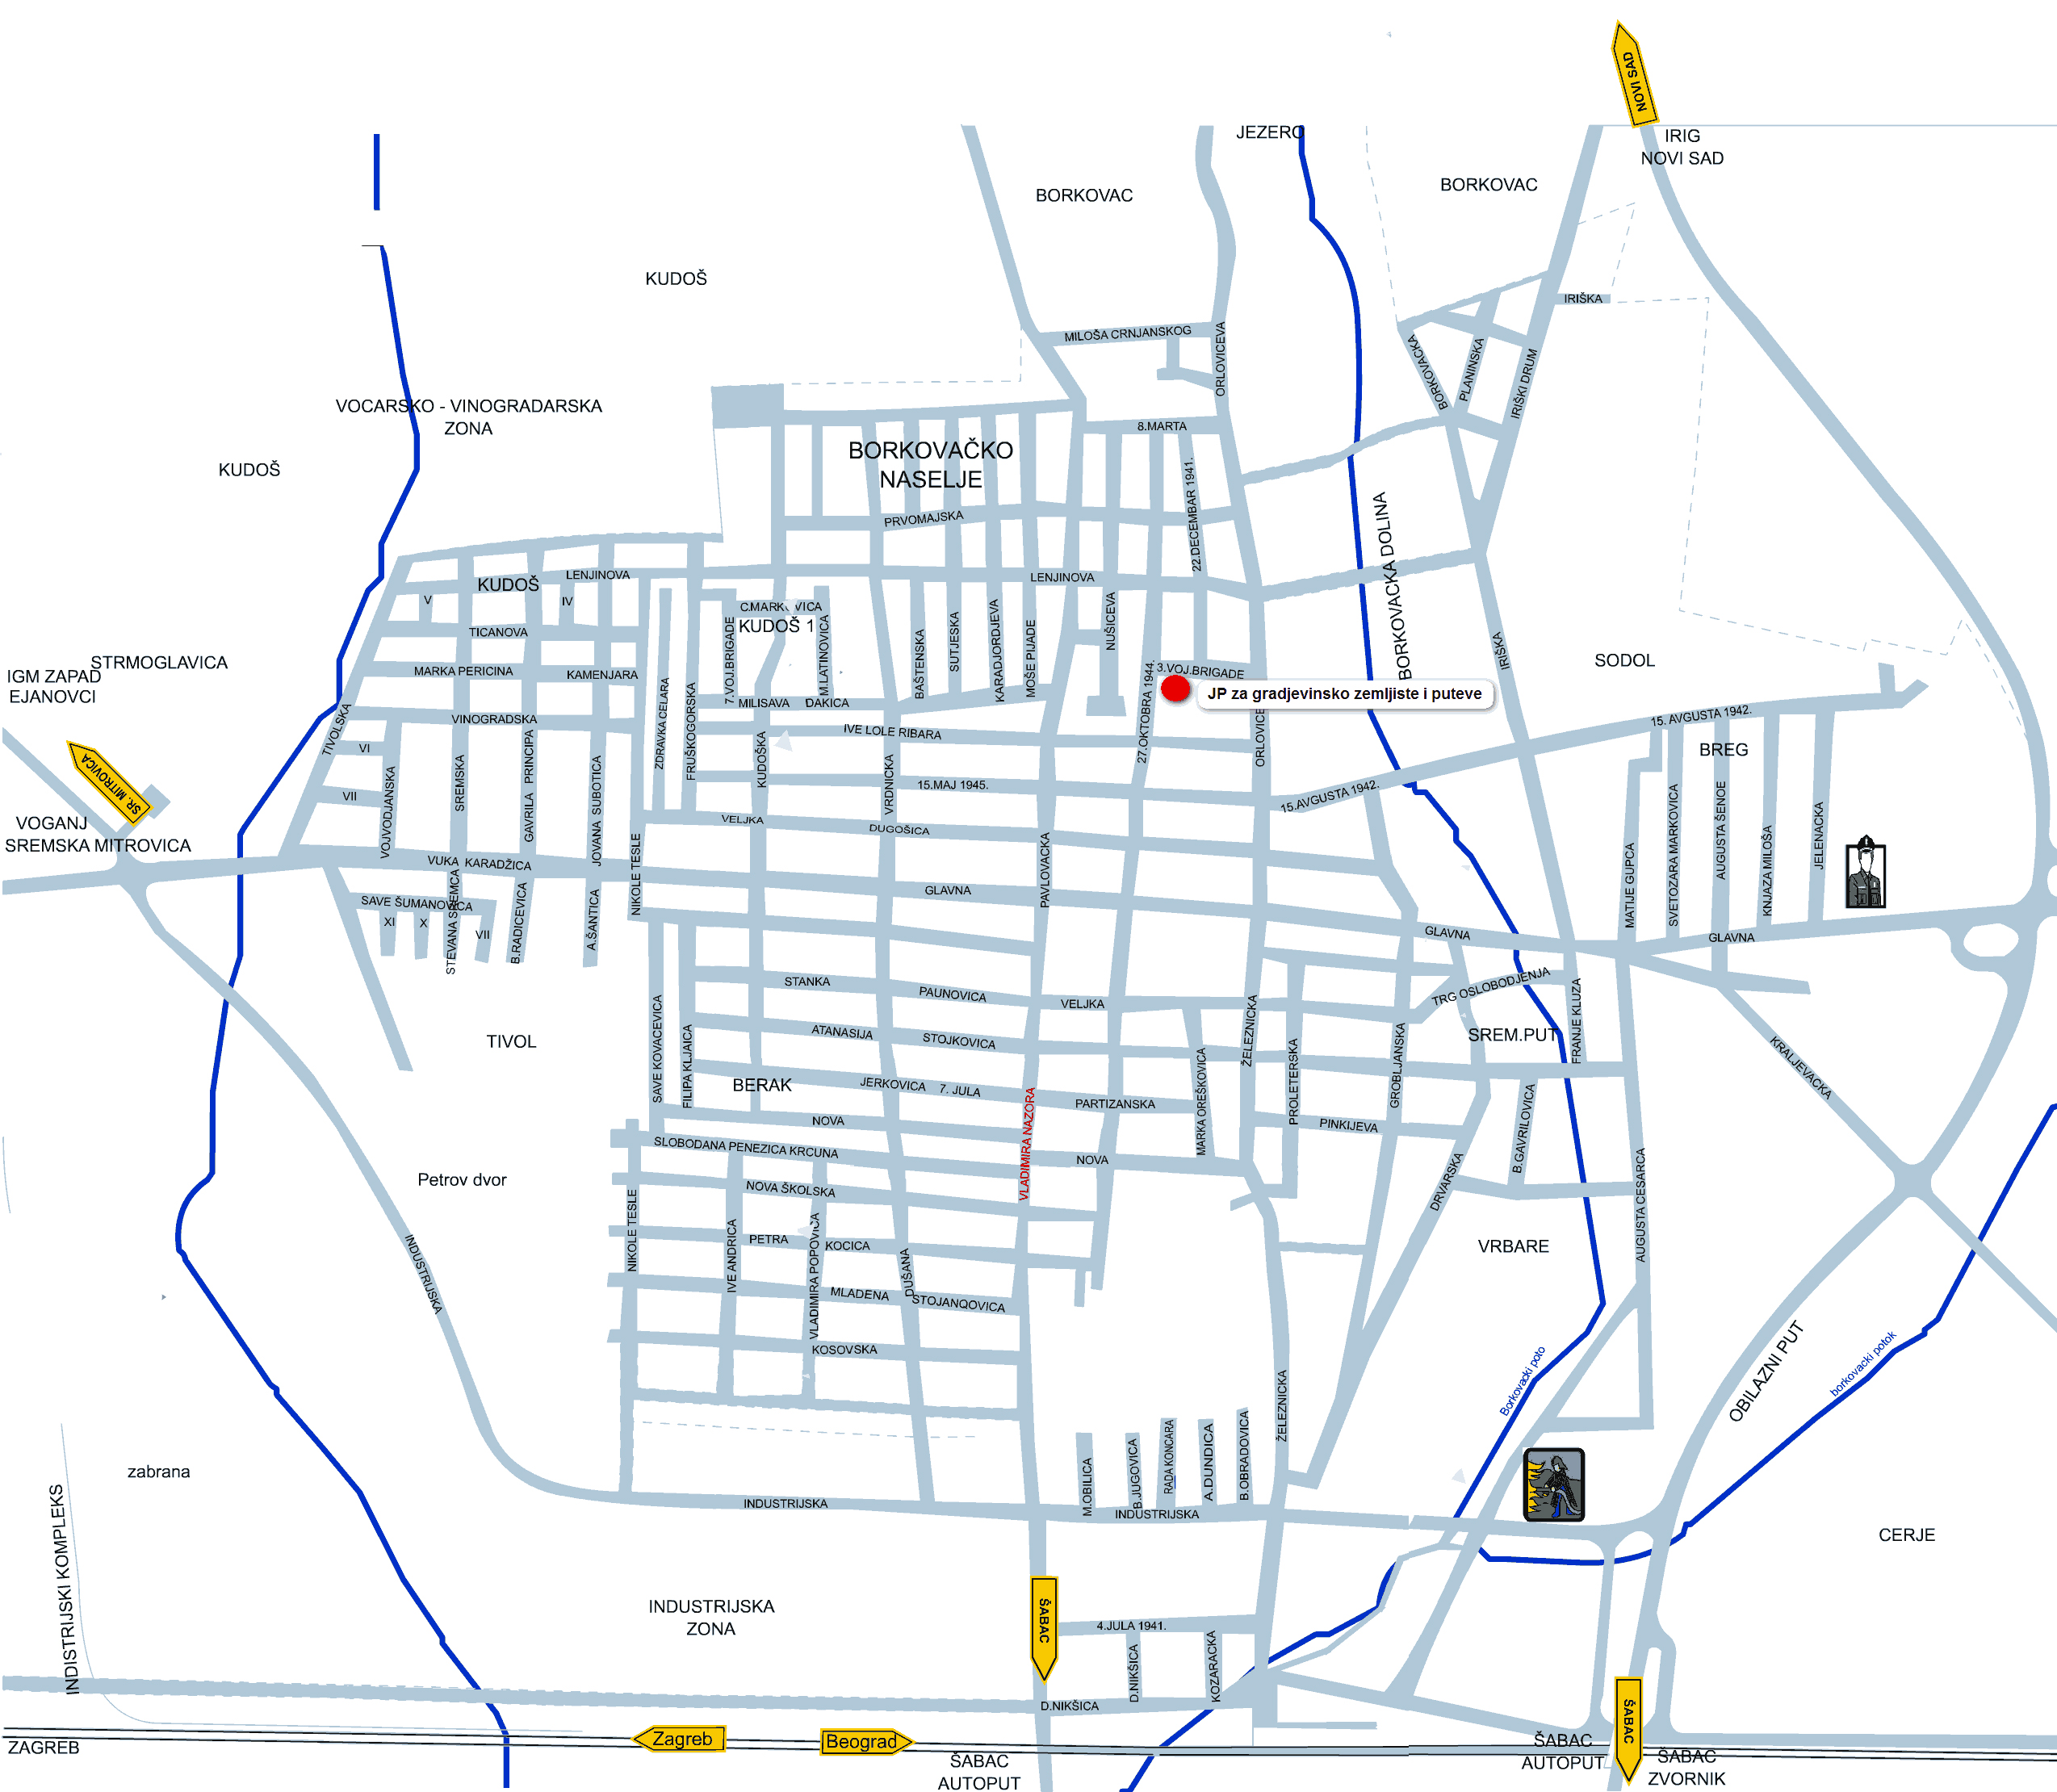 mapa rume Дирекција за изградњу Руме mapa rume